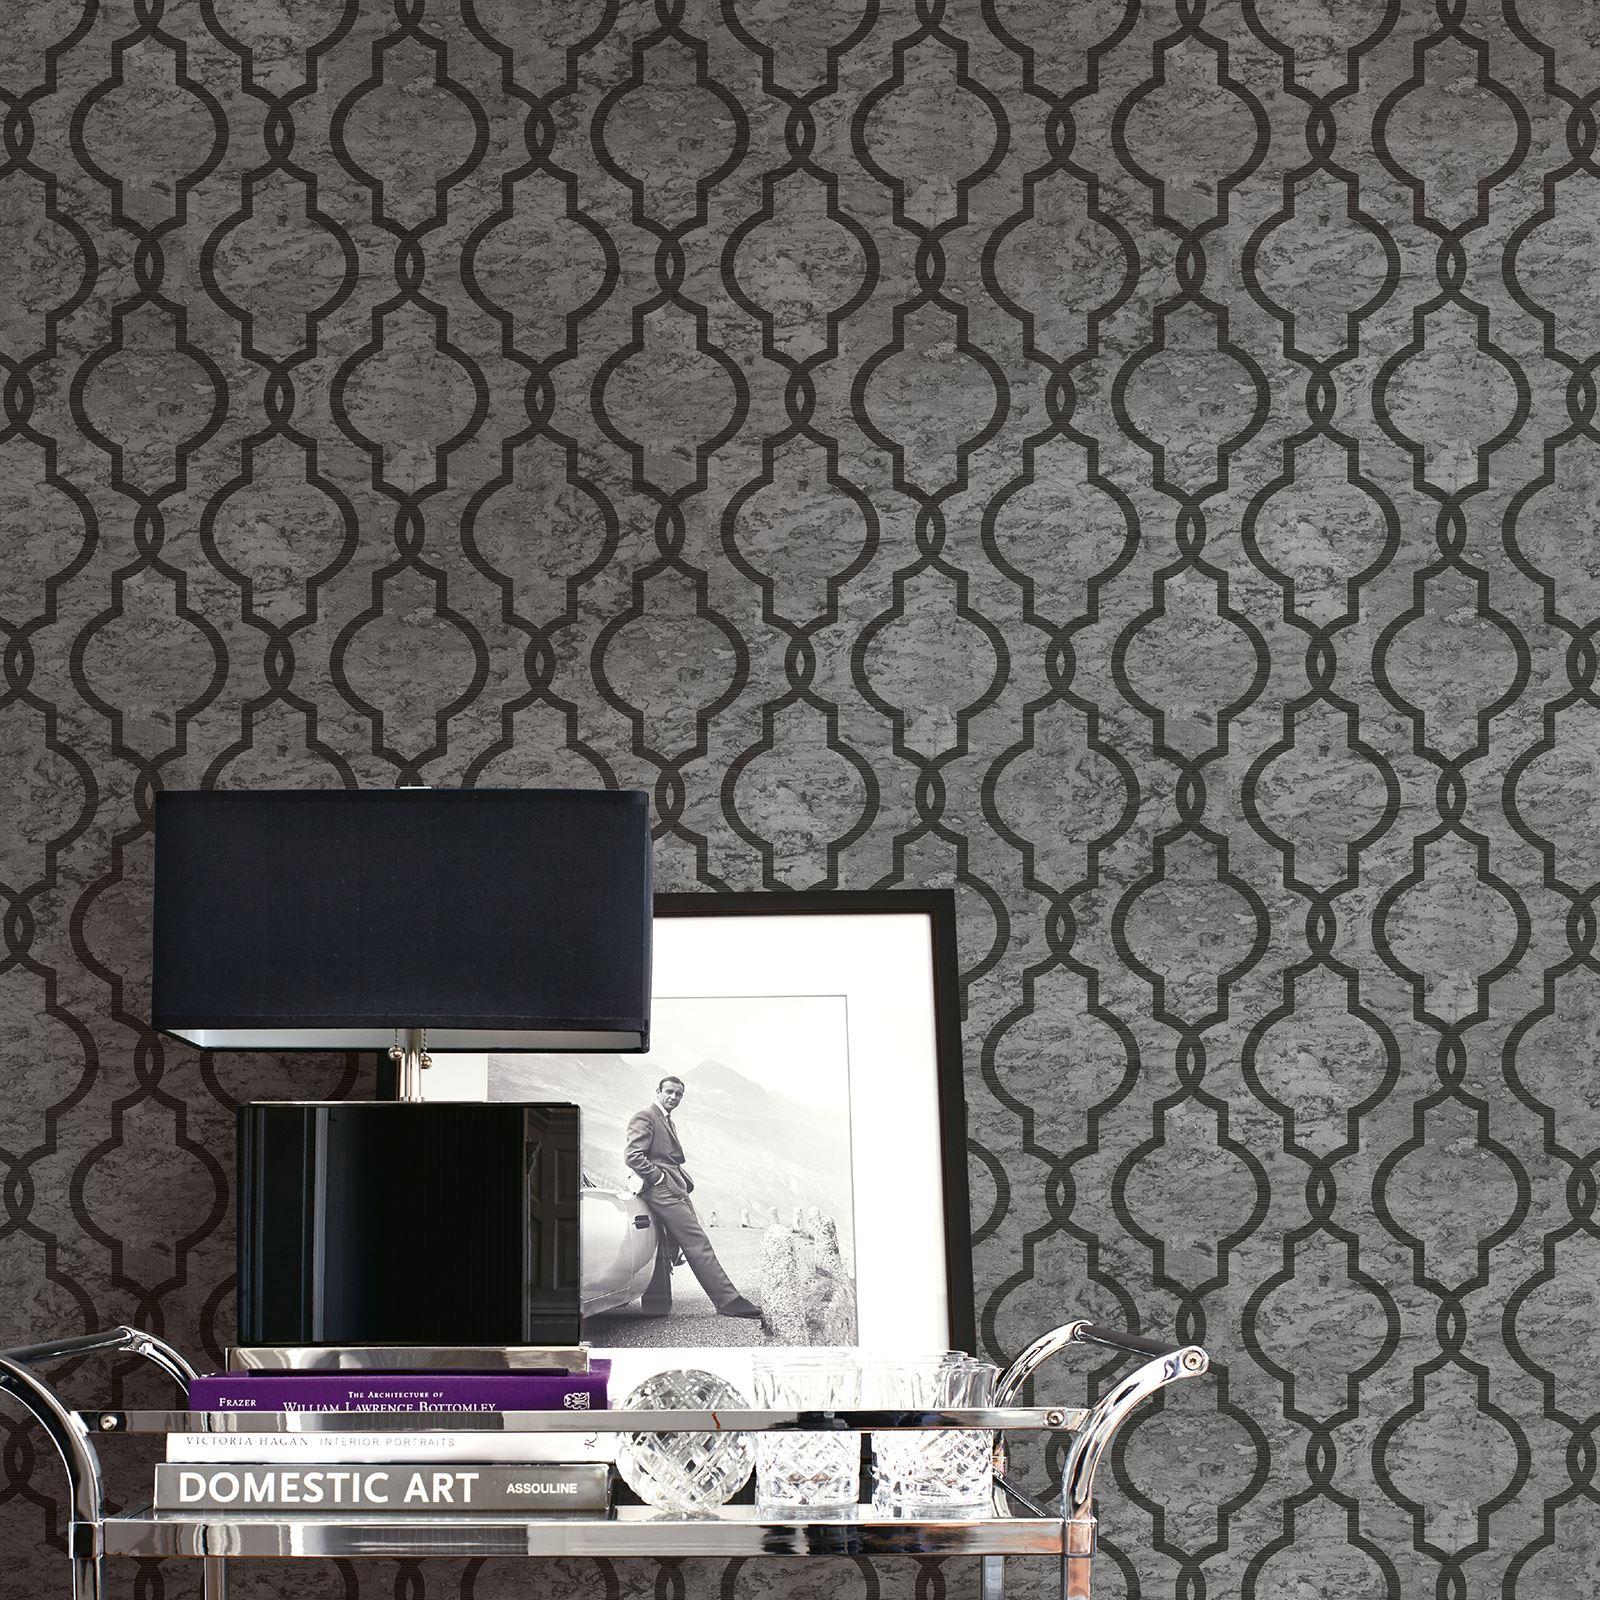 Trellis Wallpaper For Walls: CORK GEO TRELLIS WALLPAPER ASH GREY PEAR TREE UK20920